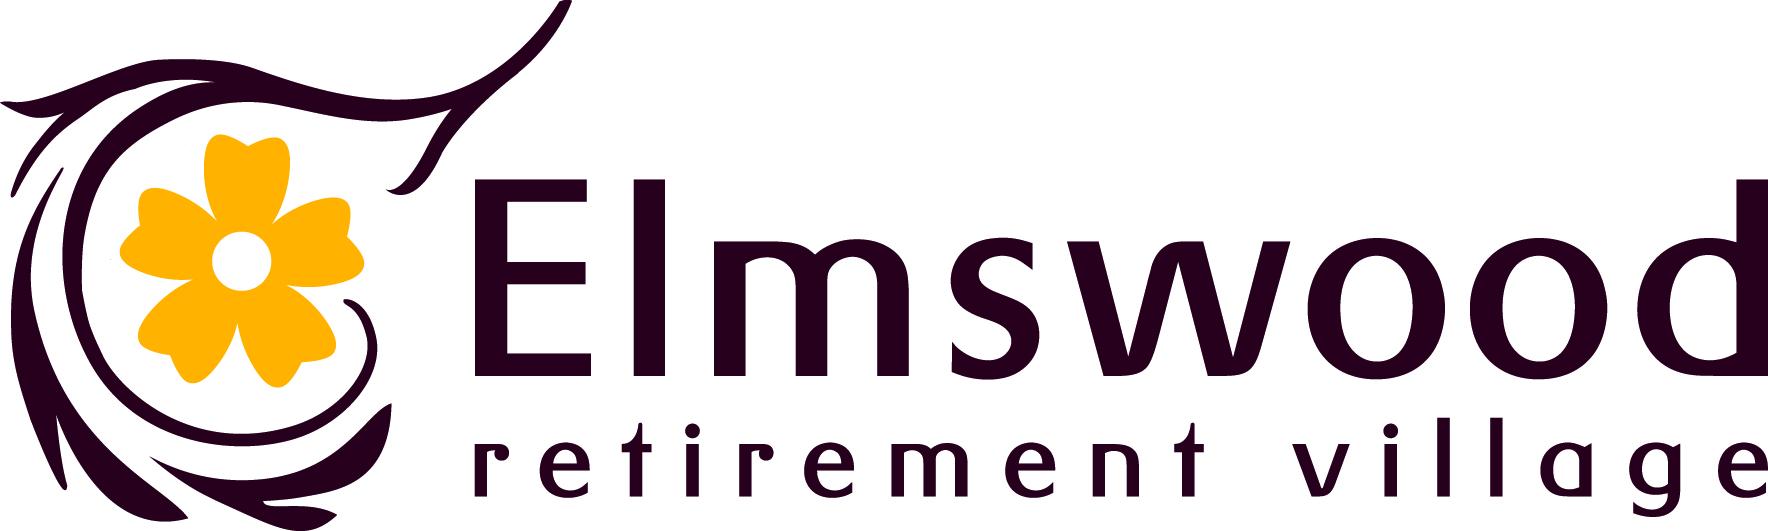 Elmswood Retirement Village (Rest home and Hospital) logo